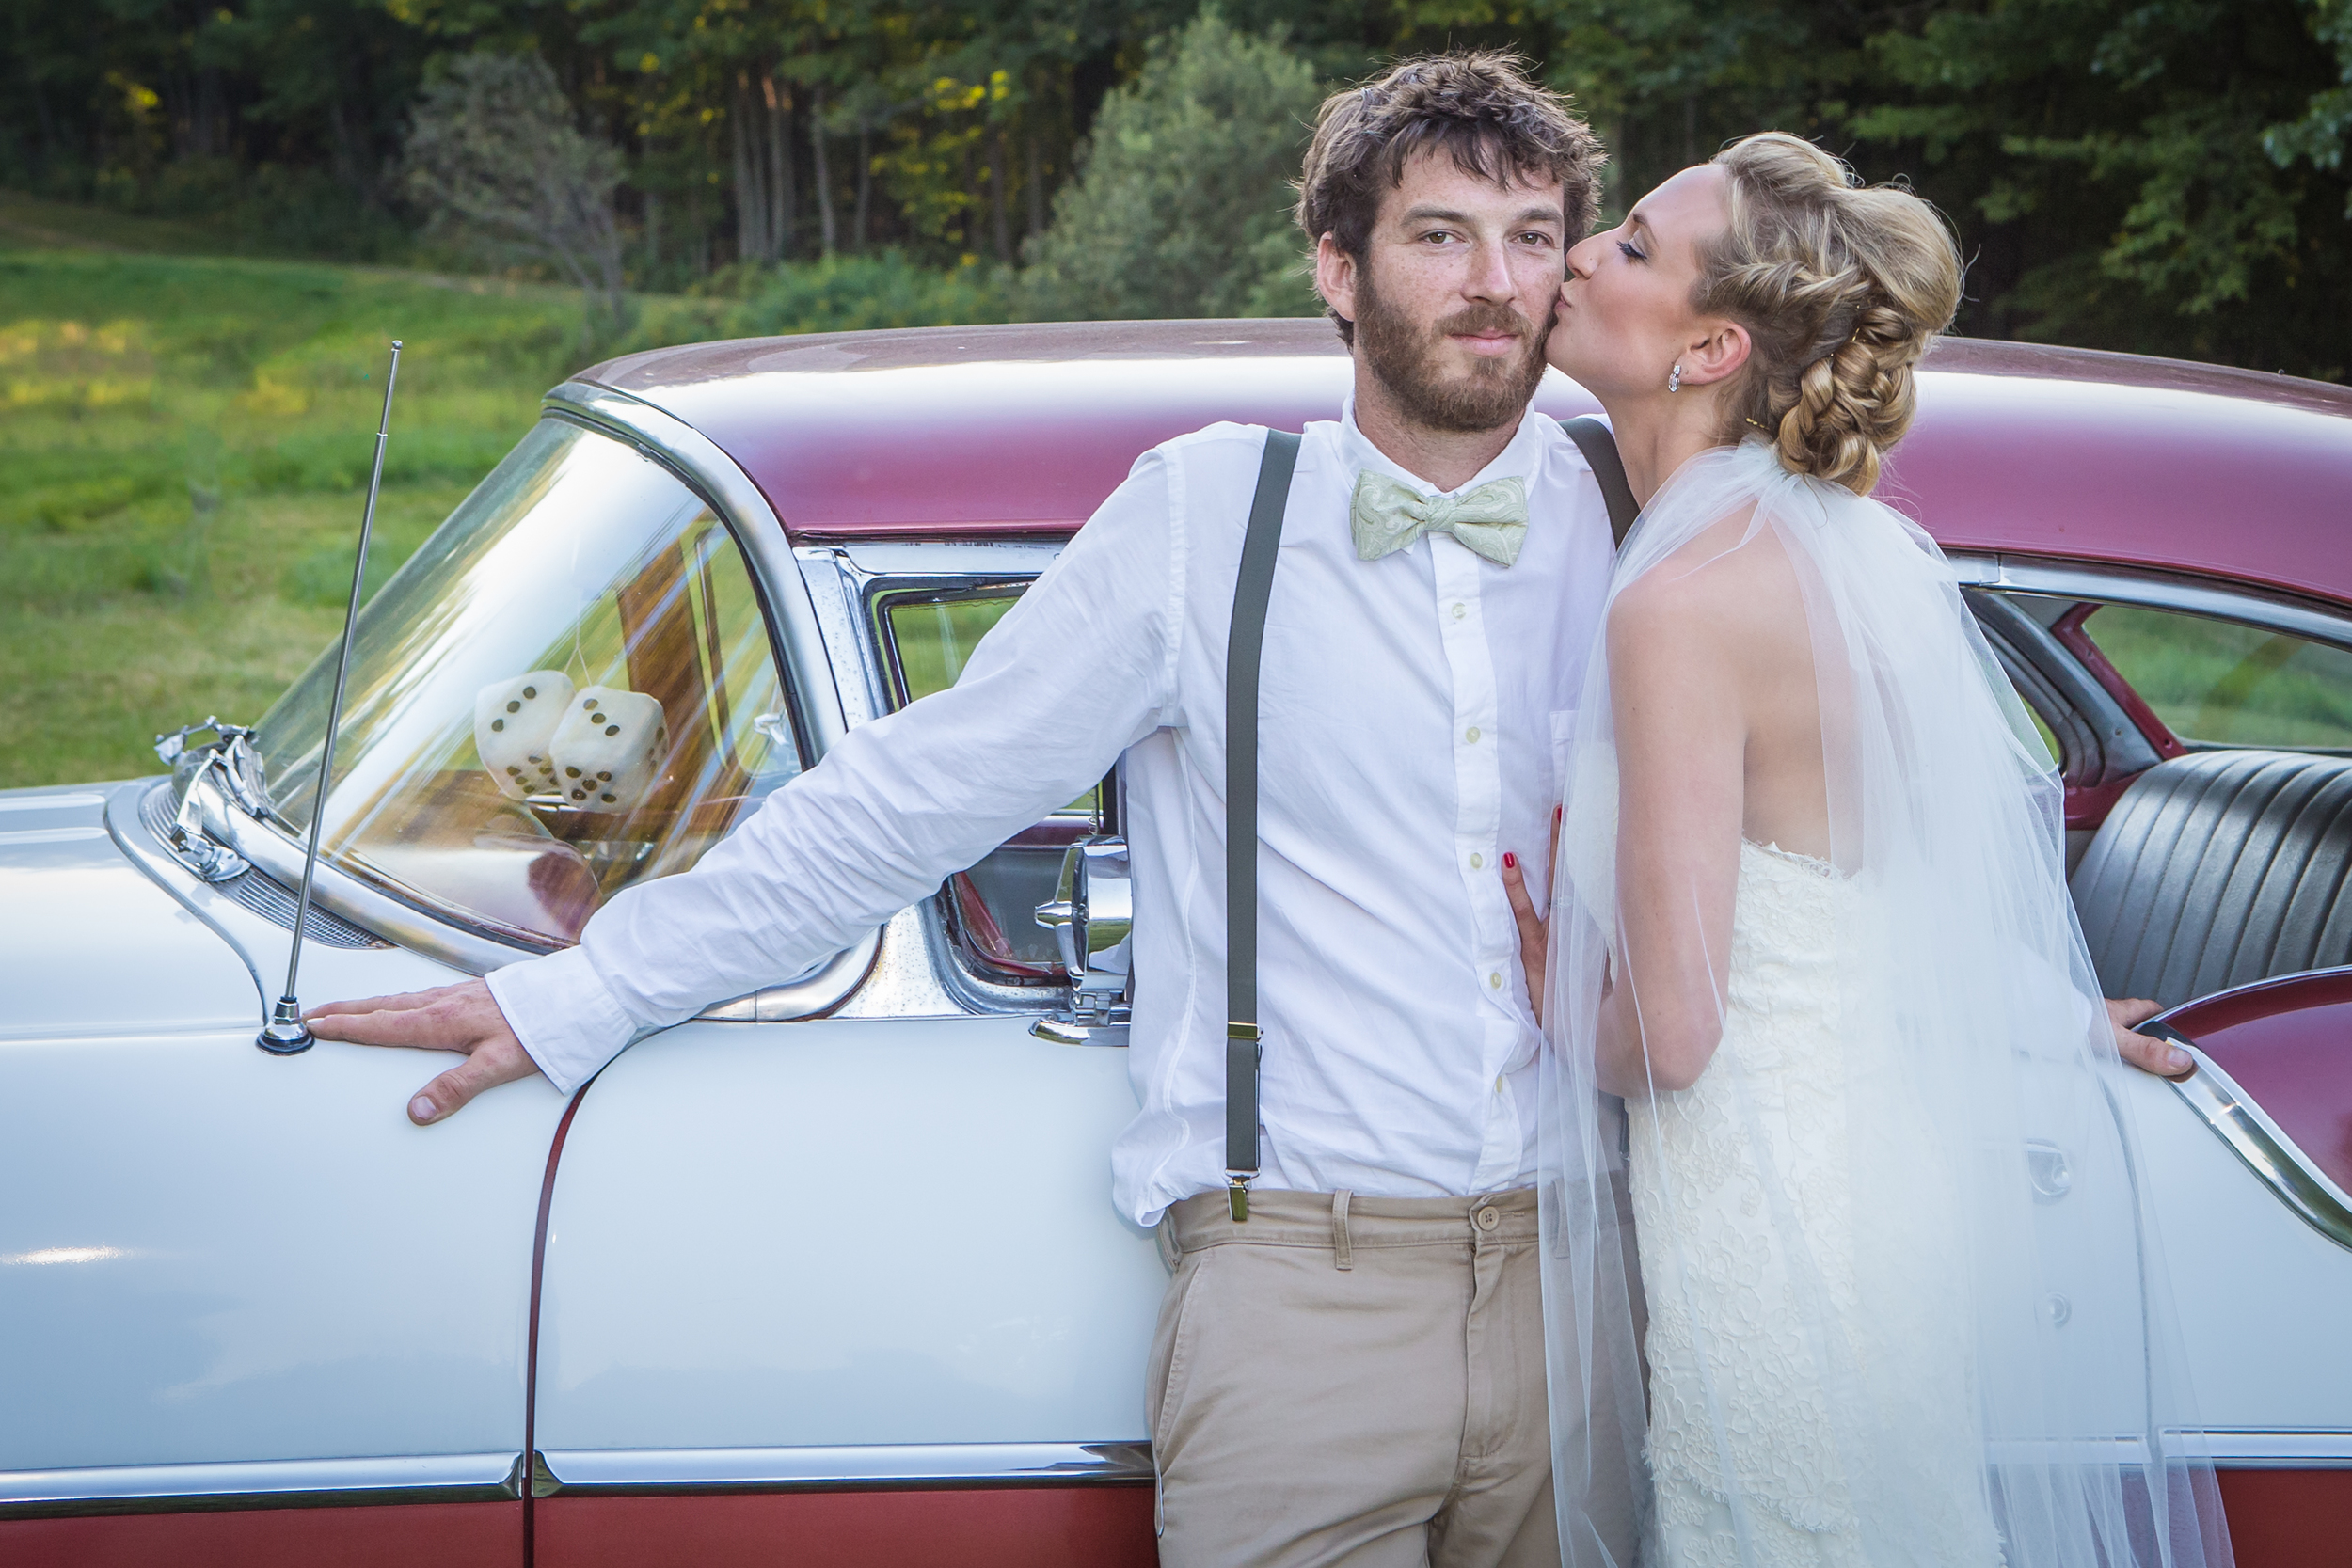 wedding bride groom kiss old car.jpg